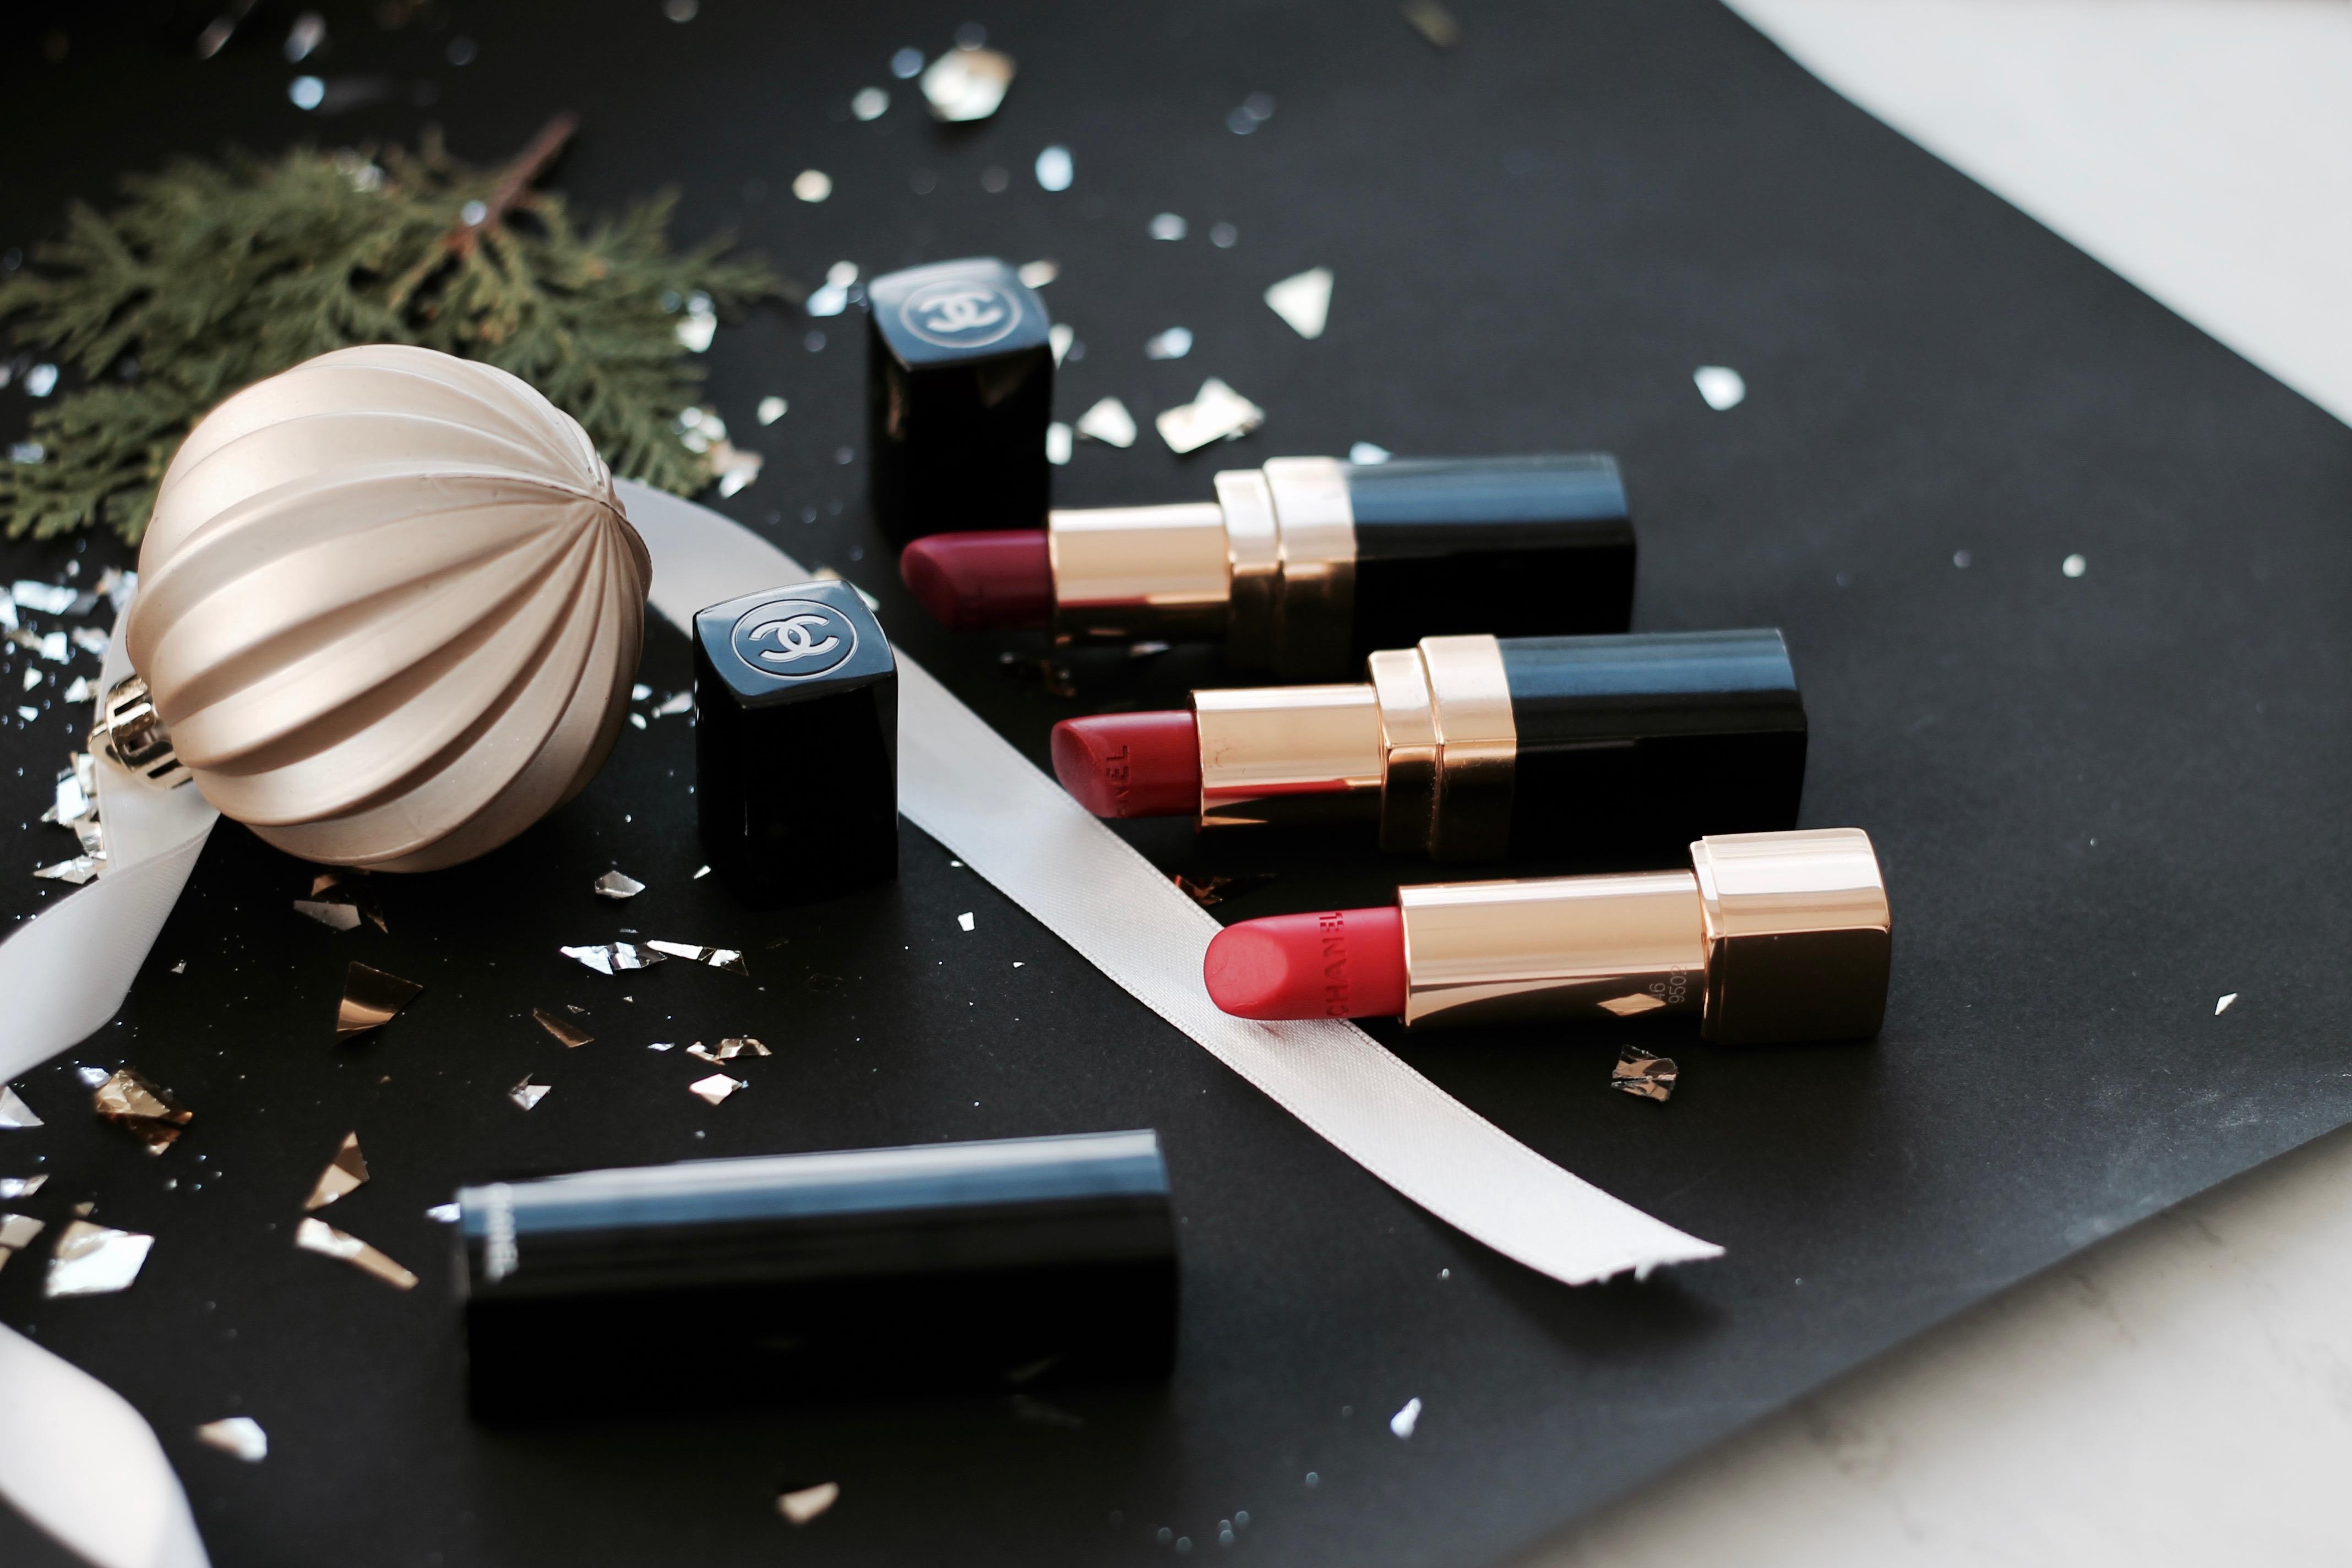 MON MODE Blog | Mon Mode | Fashion Blog | Toronto Blogger | Gift Guide Beauty Lover | Chanel